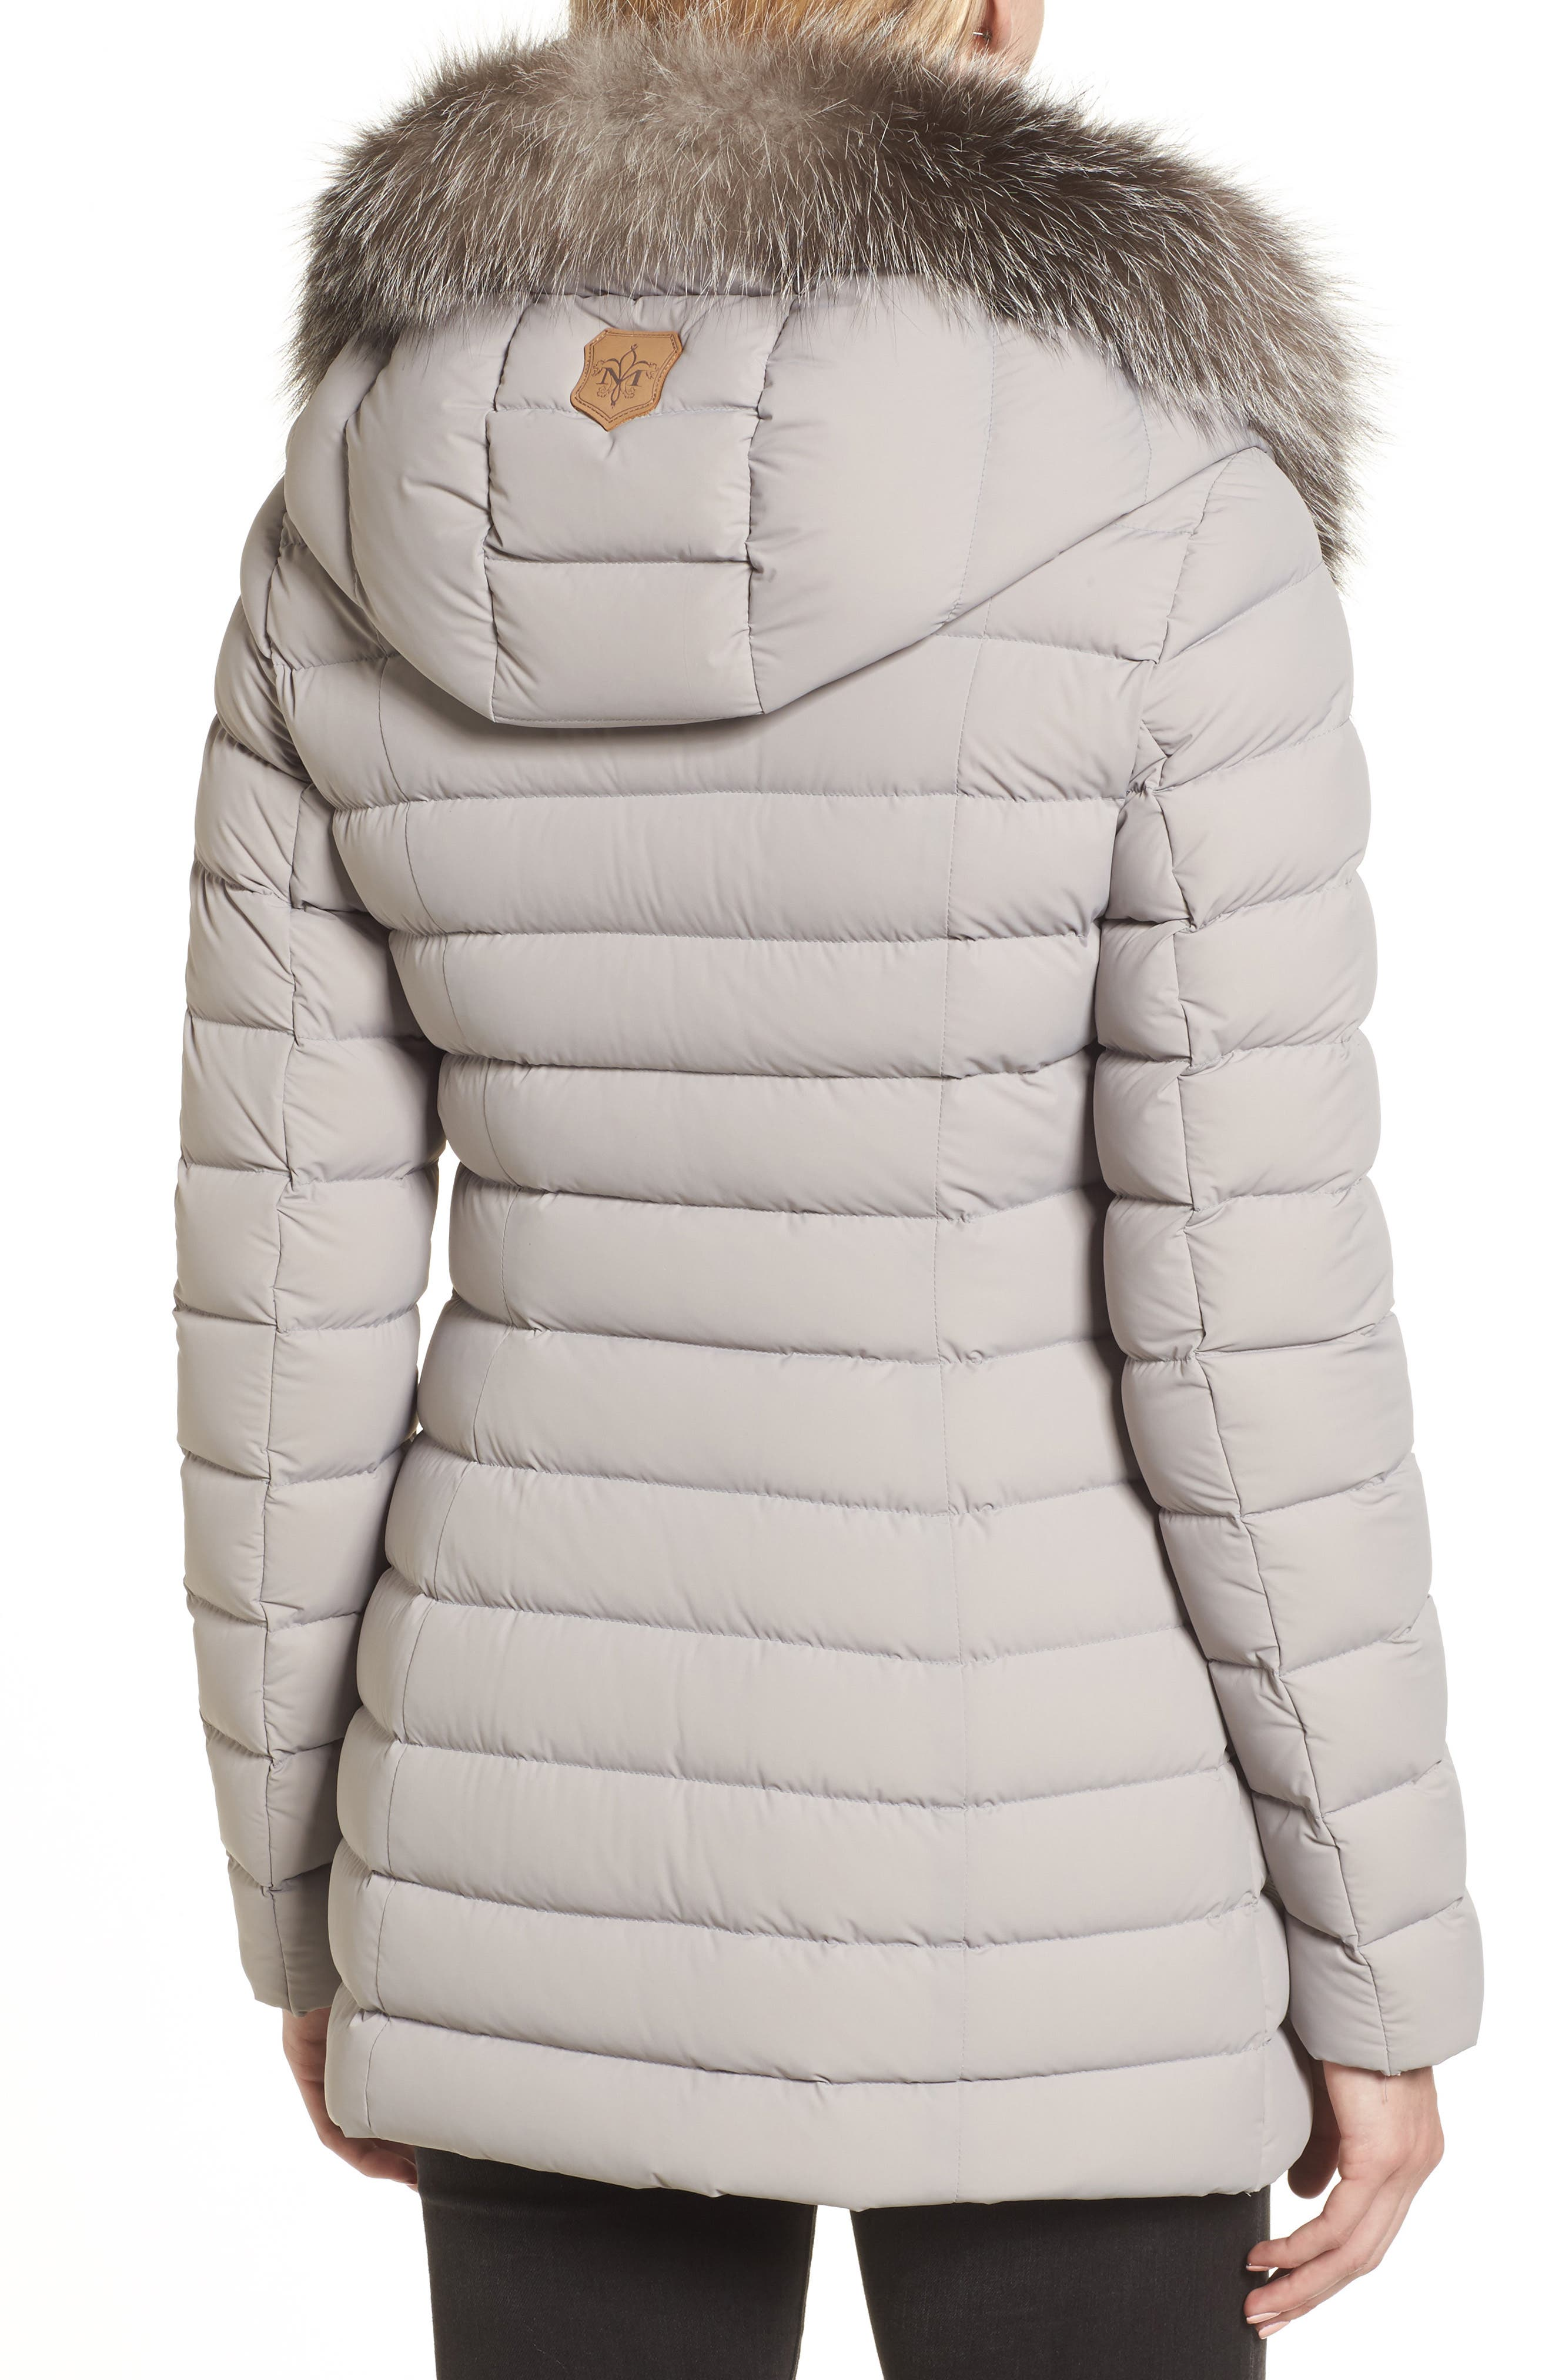 Kadalina Down Jacket with Genuine Fox Fur Trim,                             Alternate thumbnail 2, color,                             082